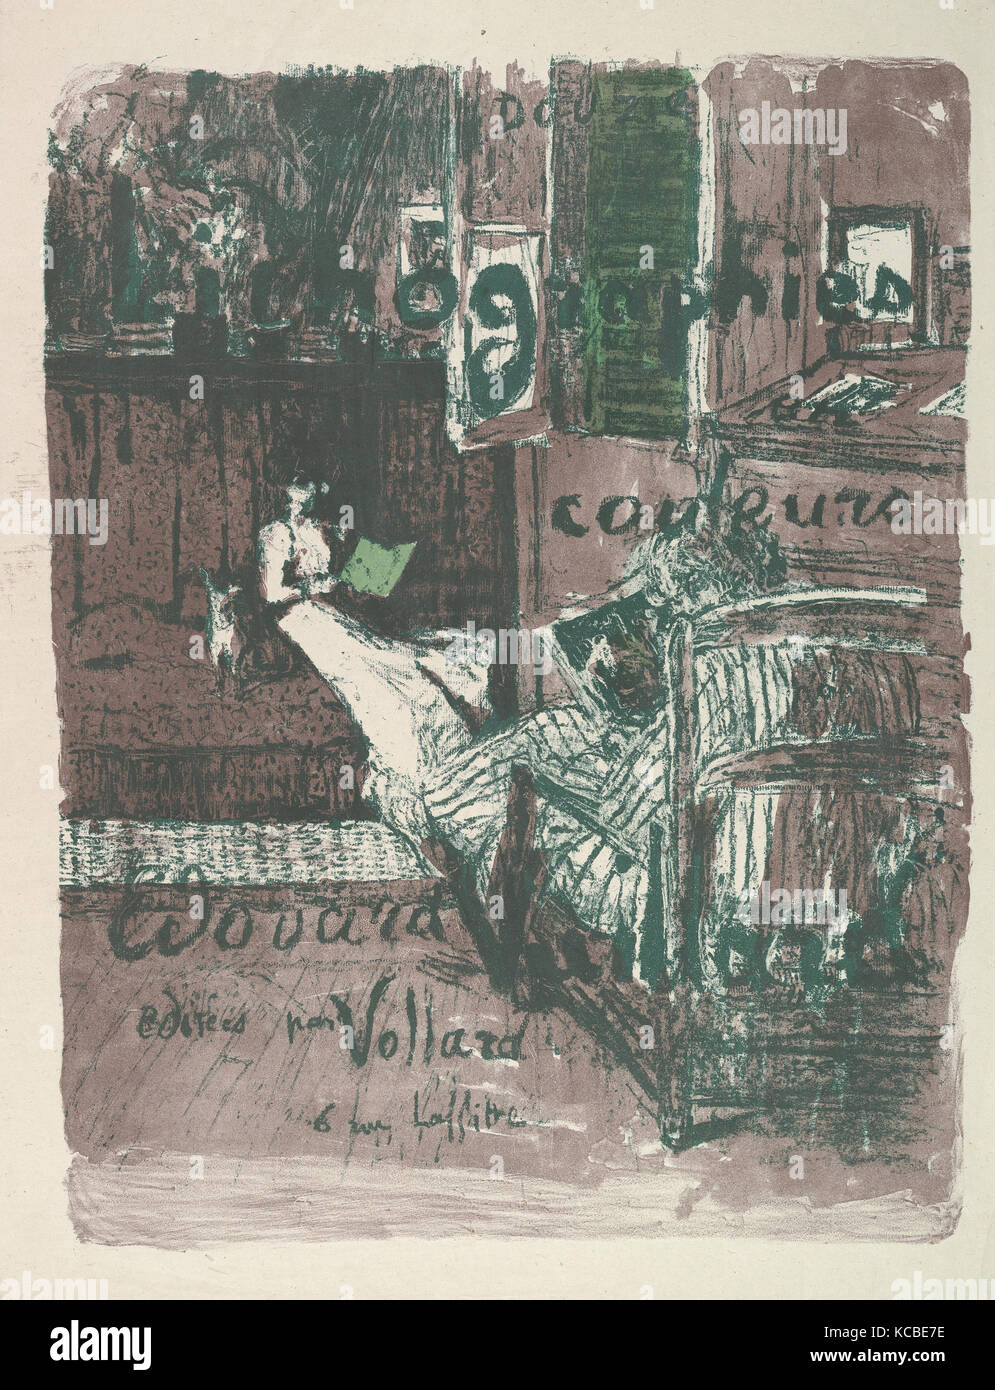 Cover for the album Landscapes and Interiors (Vollard Portfolio), Édouard Vuillard, 1899 - Stock Image